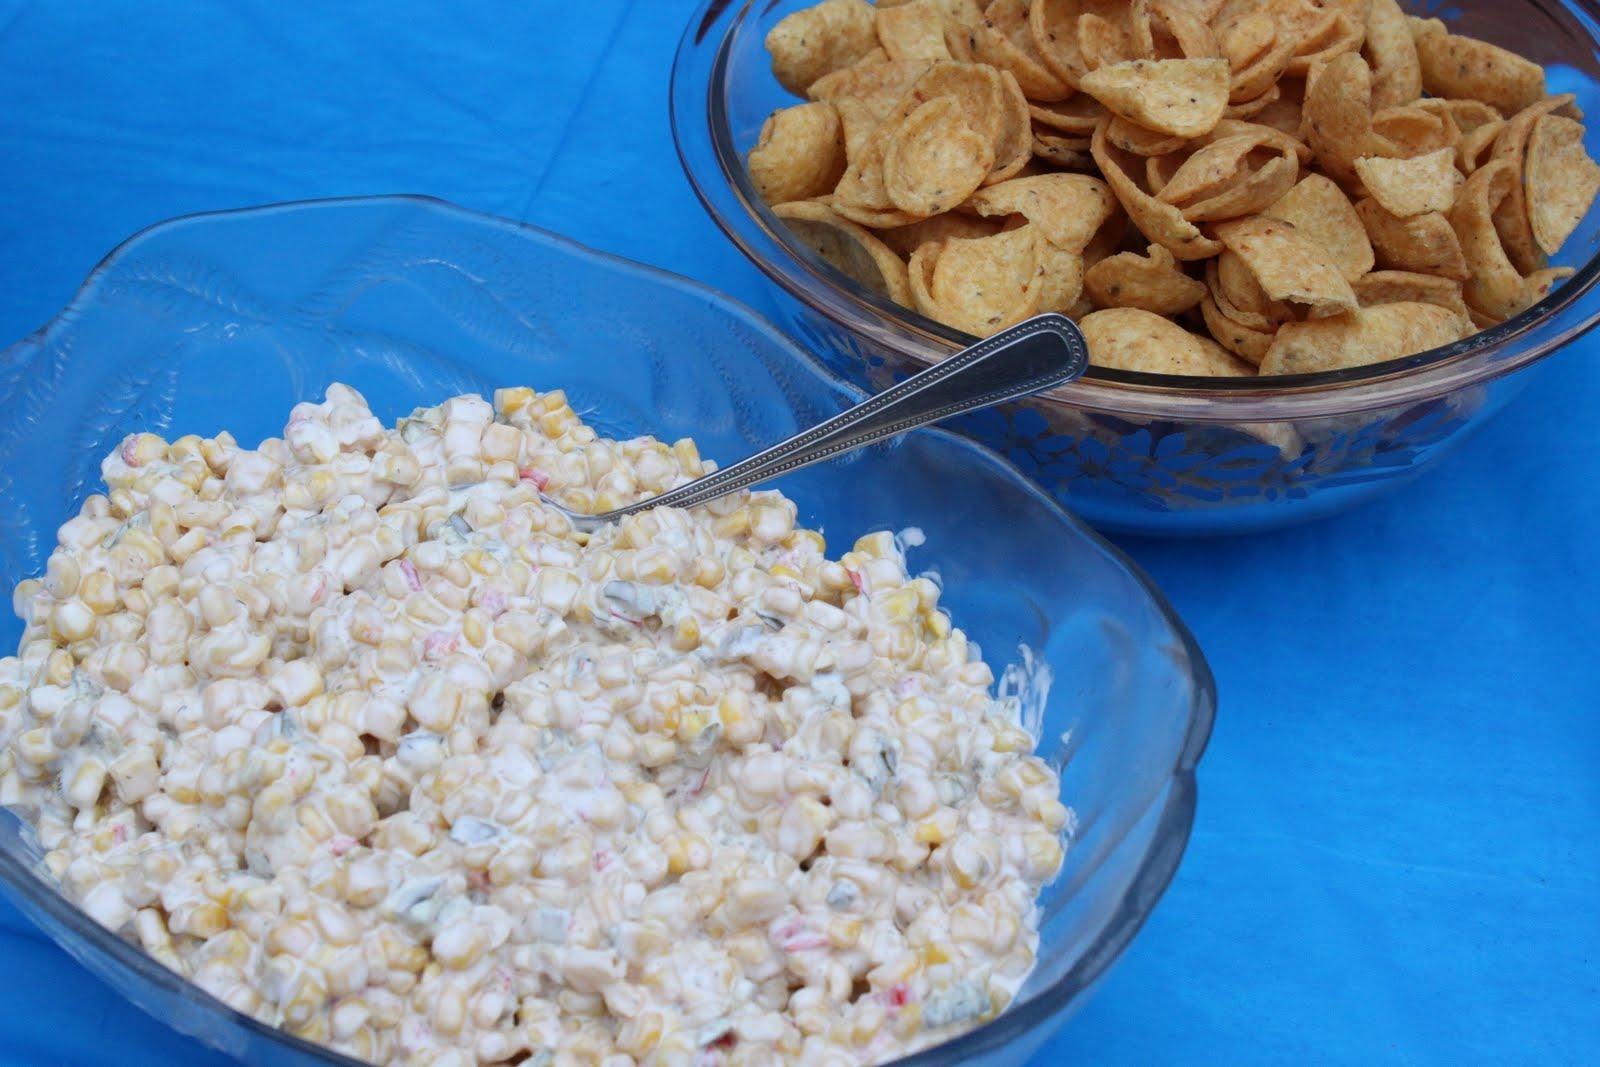 Spicy Creamy Artichoke Dip With Corn And Cayenne Recipes — Dishmaps